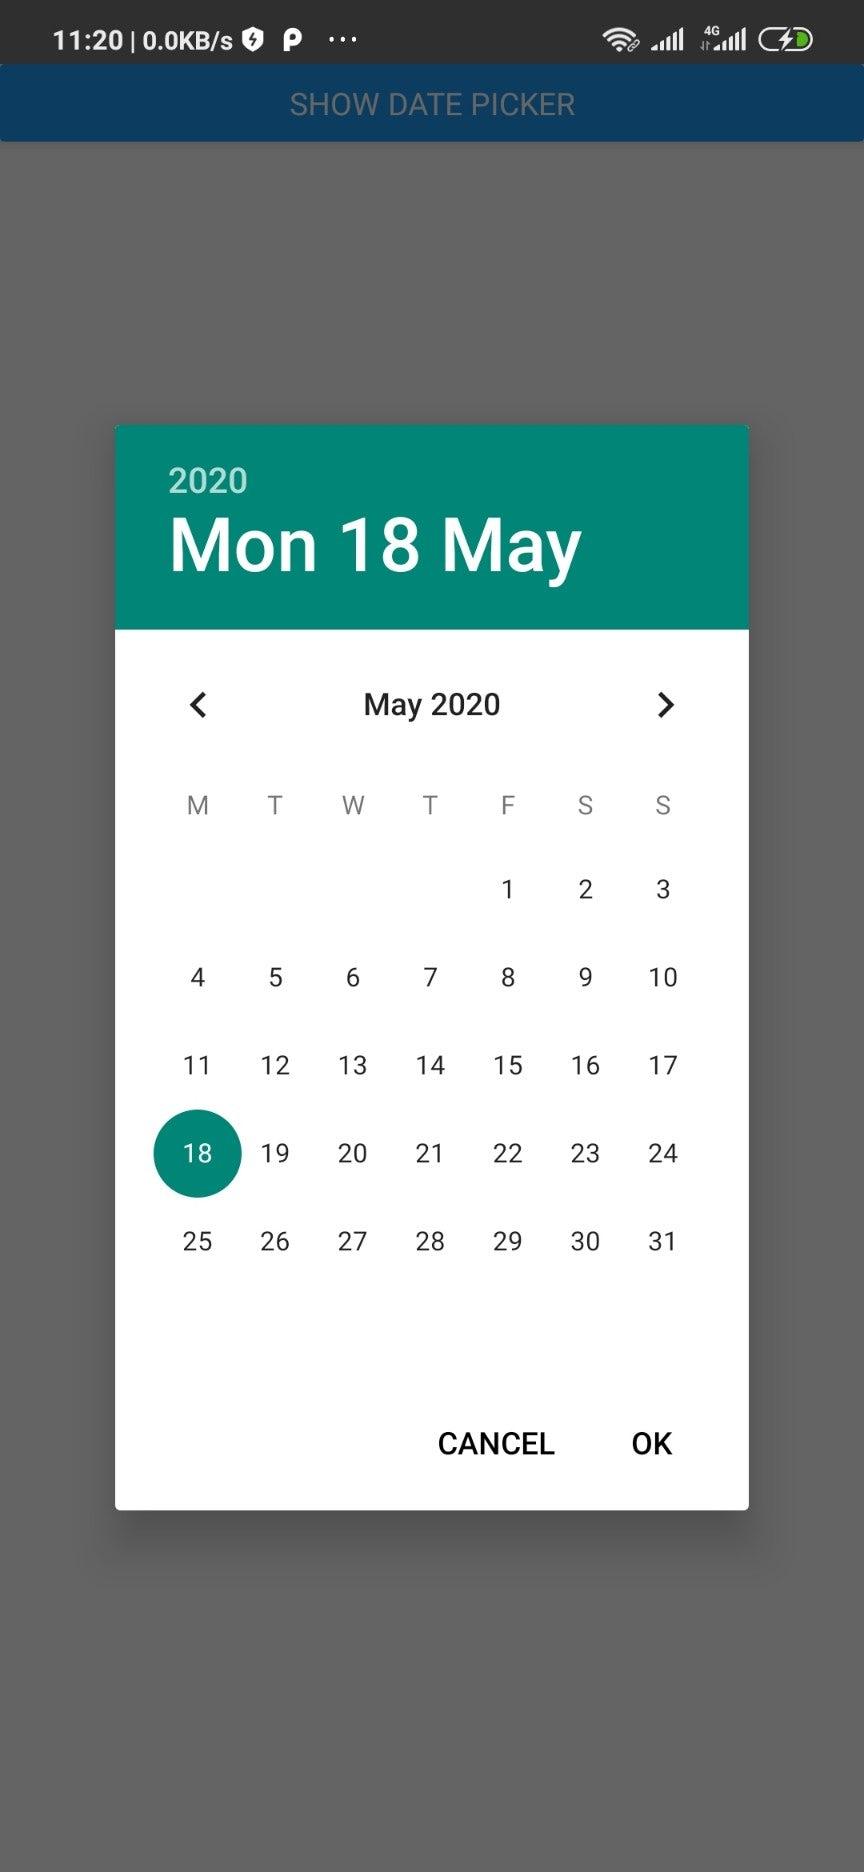 Screenshot_2020-05-18-11-20-19-158_com.reactnativetutorials-864x1872.jpg